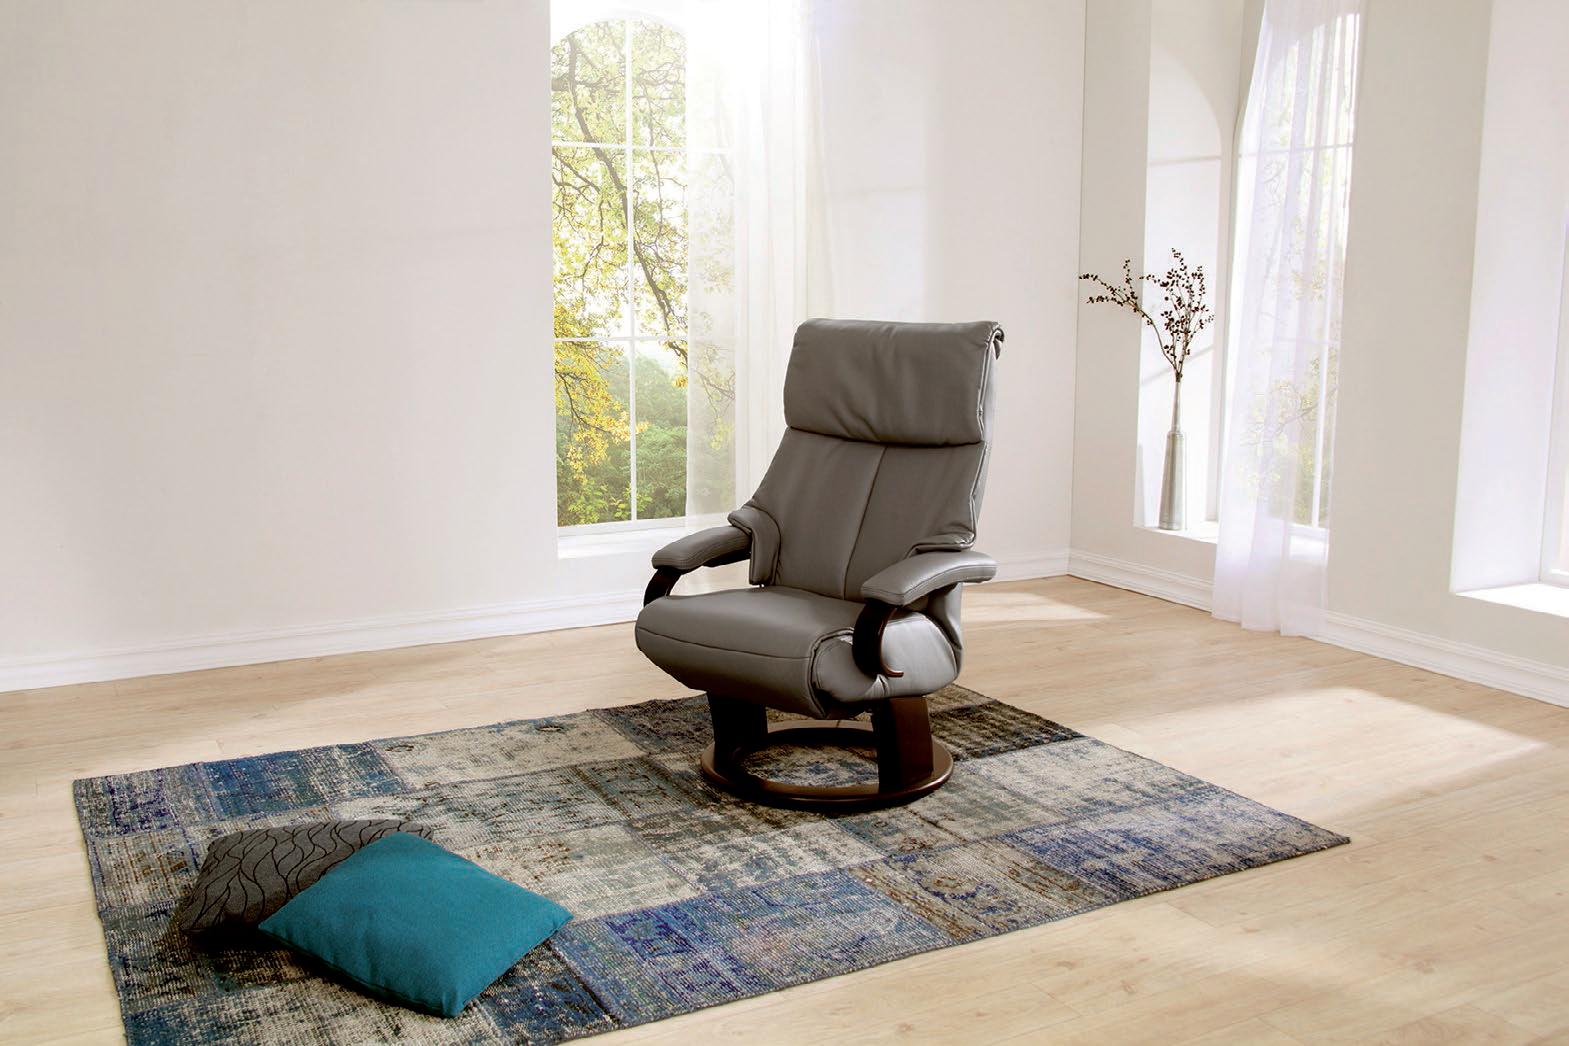 modell 5147 fernsehsessel topsofa m bel zu spitzenpreisen. Black Bedroom Furniture Sets. Home Design Ideas